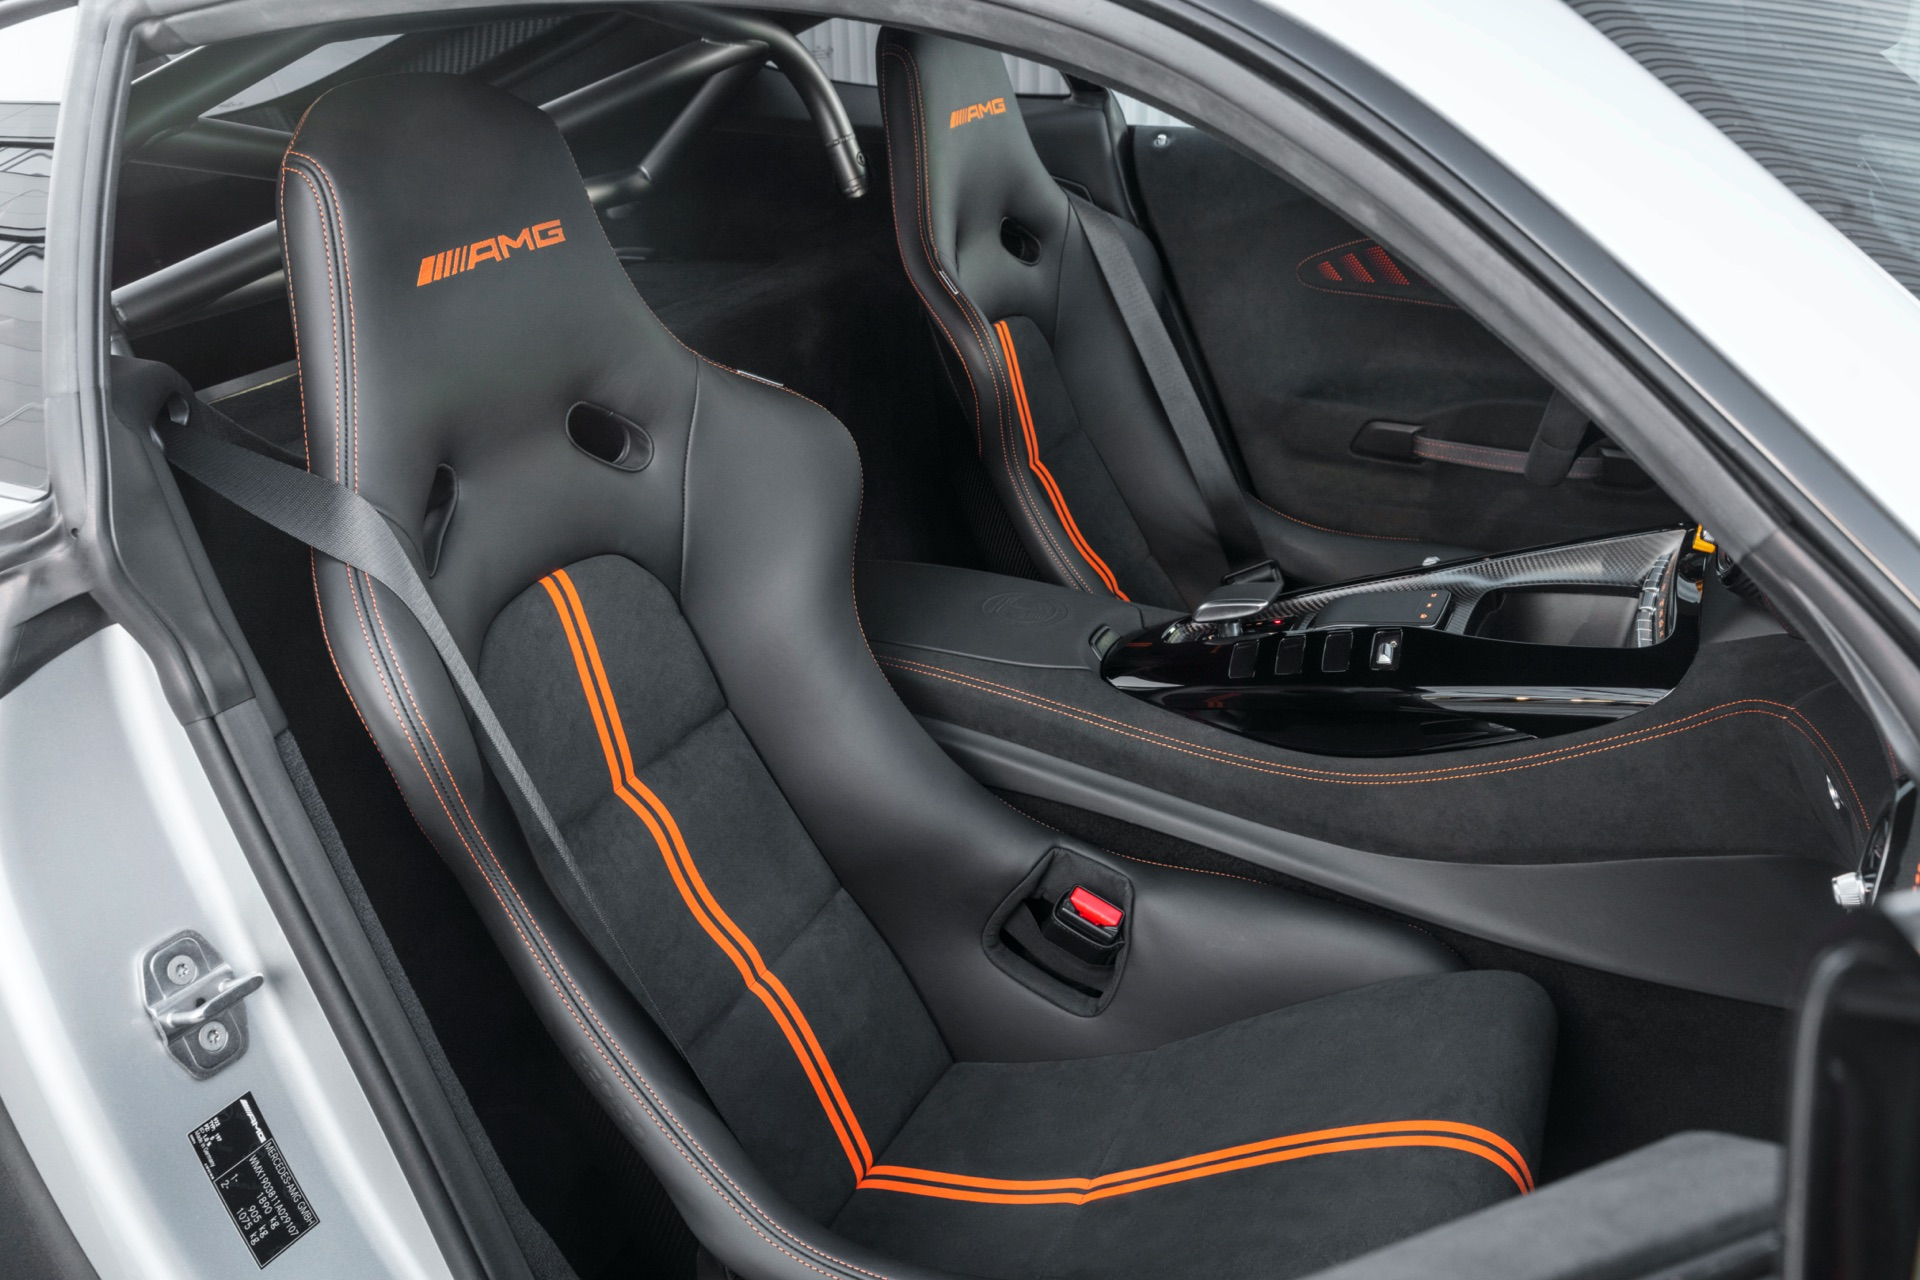 Mercedes-AMG GT Black Series Seats